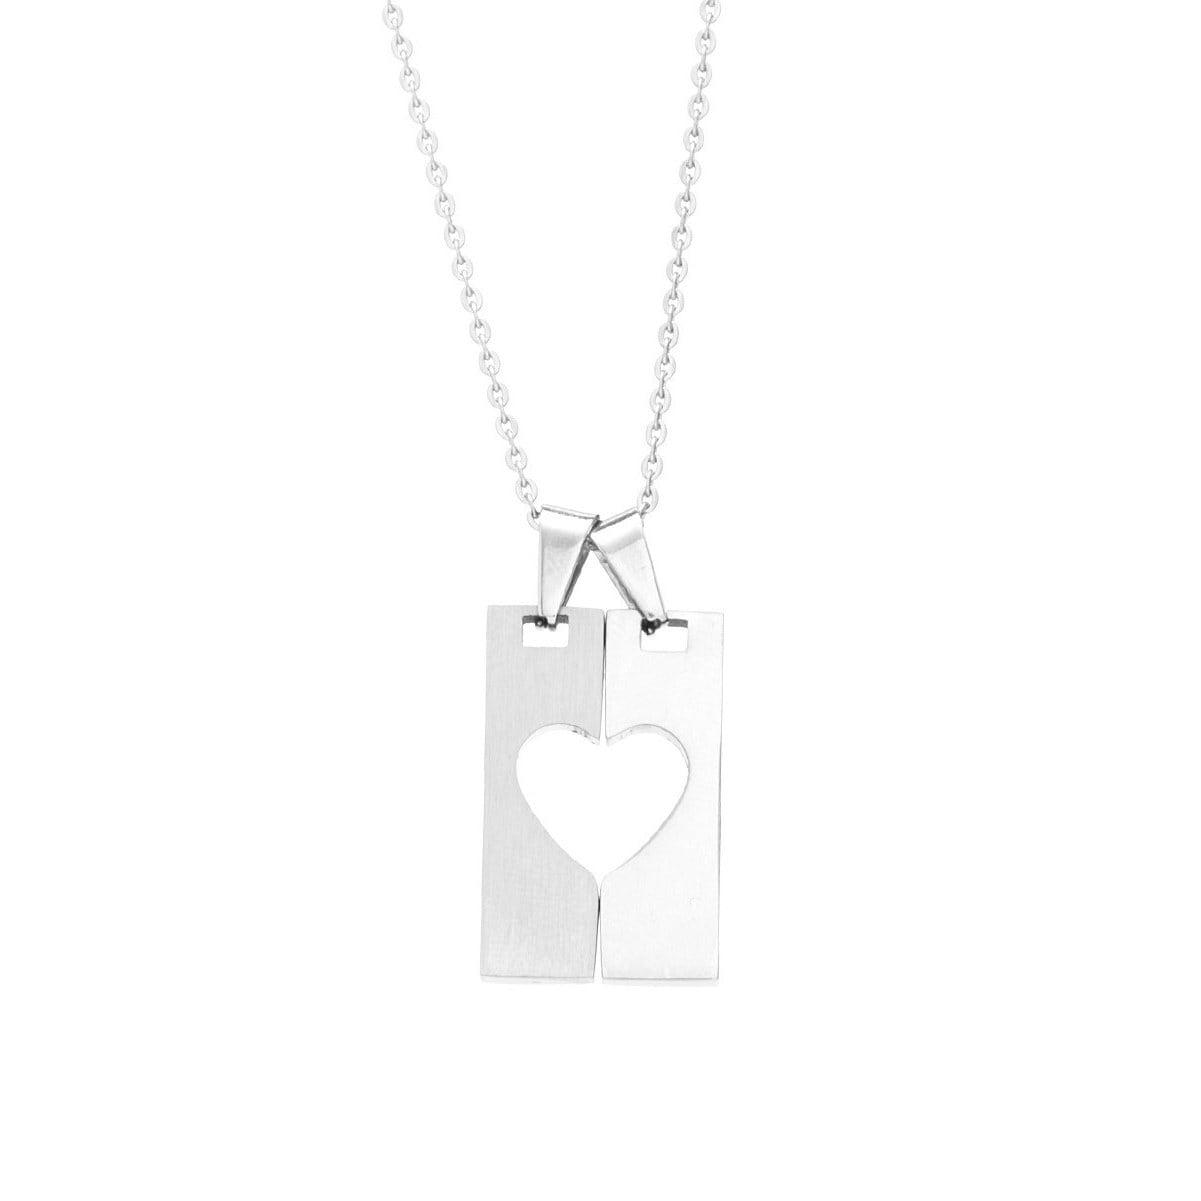 Shop james cavolini stainless steel heart lock pendant necklace shop james cavolini stainless steel heart lock pendant necklace free shipping today overstock 10426564 aloadofball Images